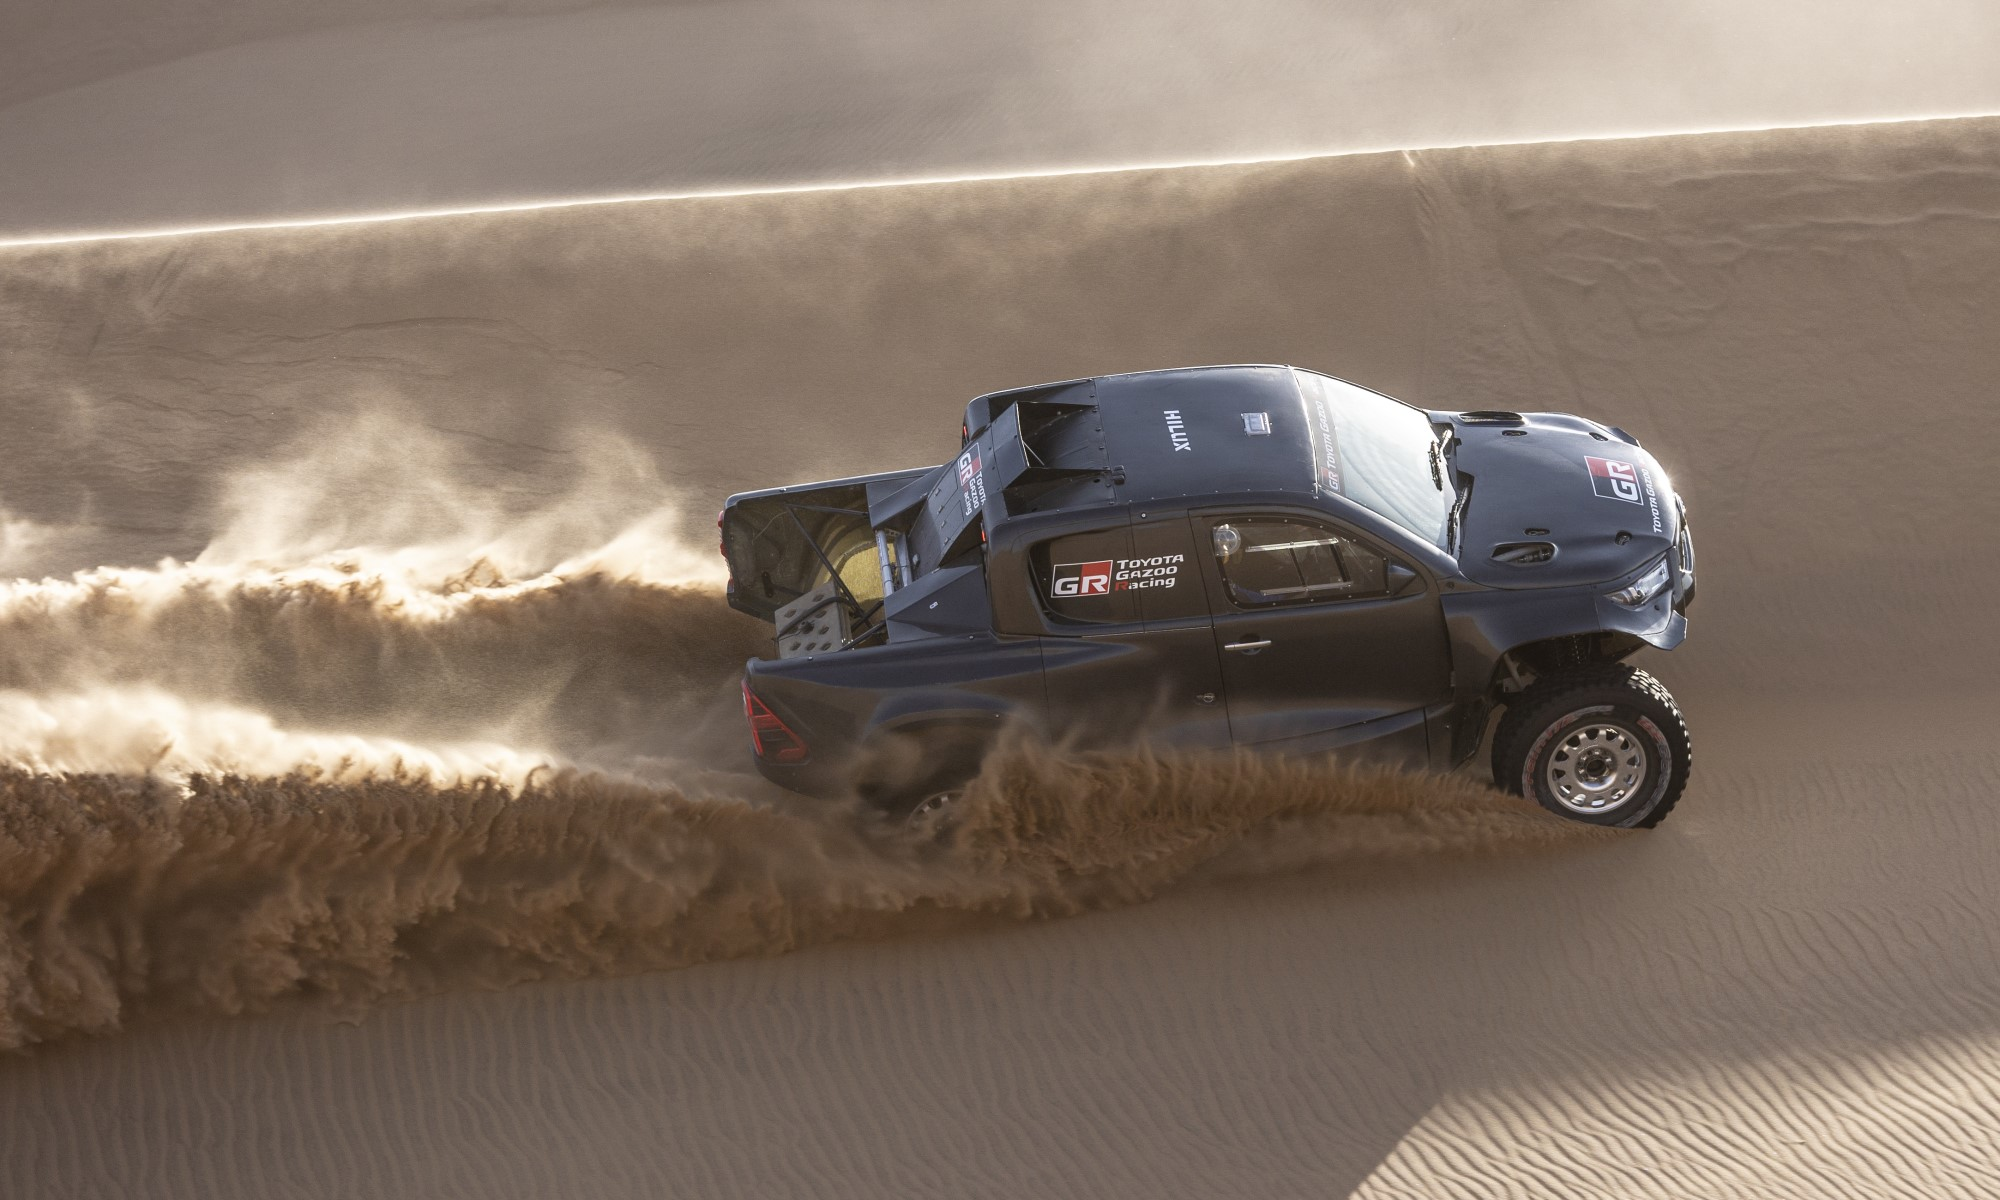 Toyota GR DKR Hilux T1+ during testing